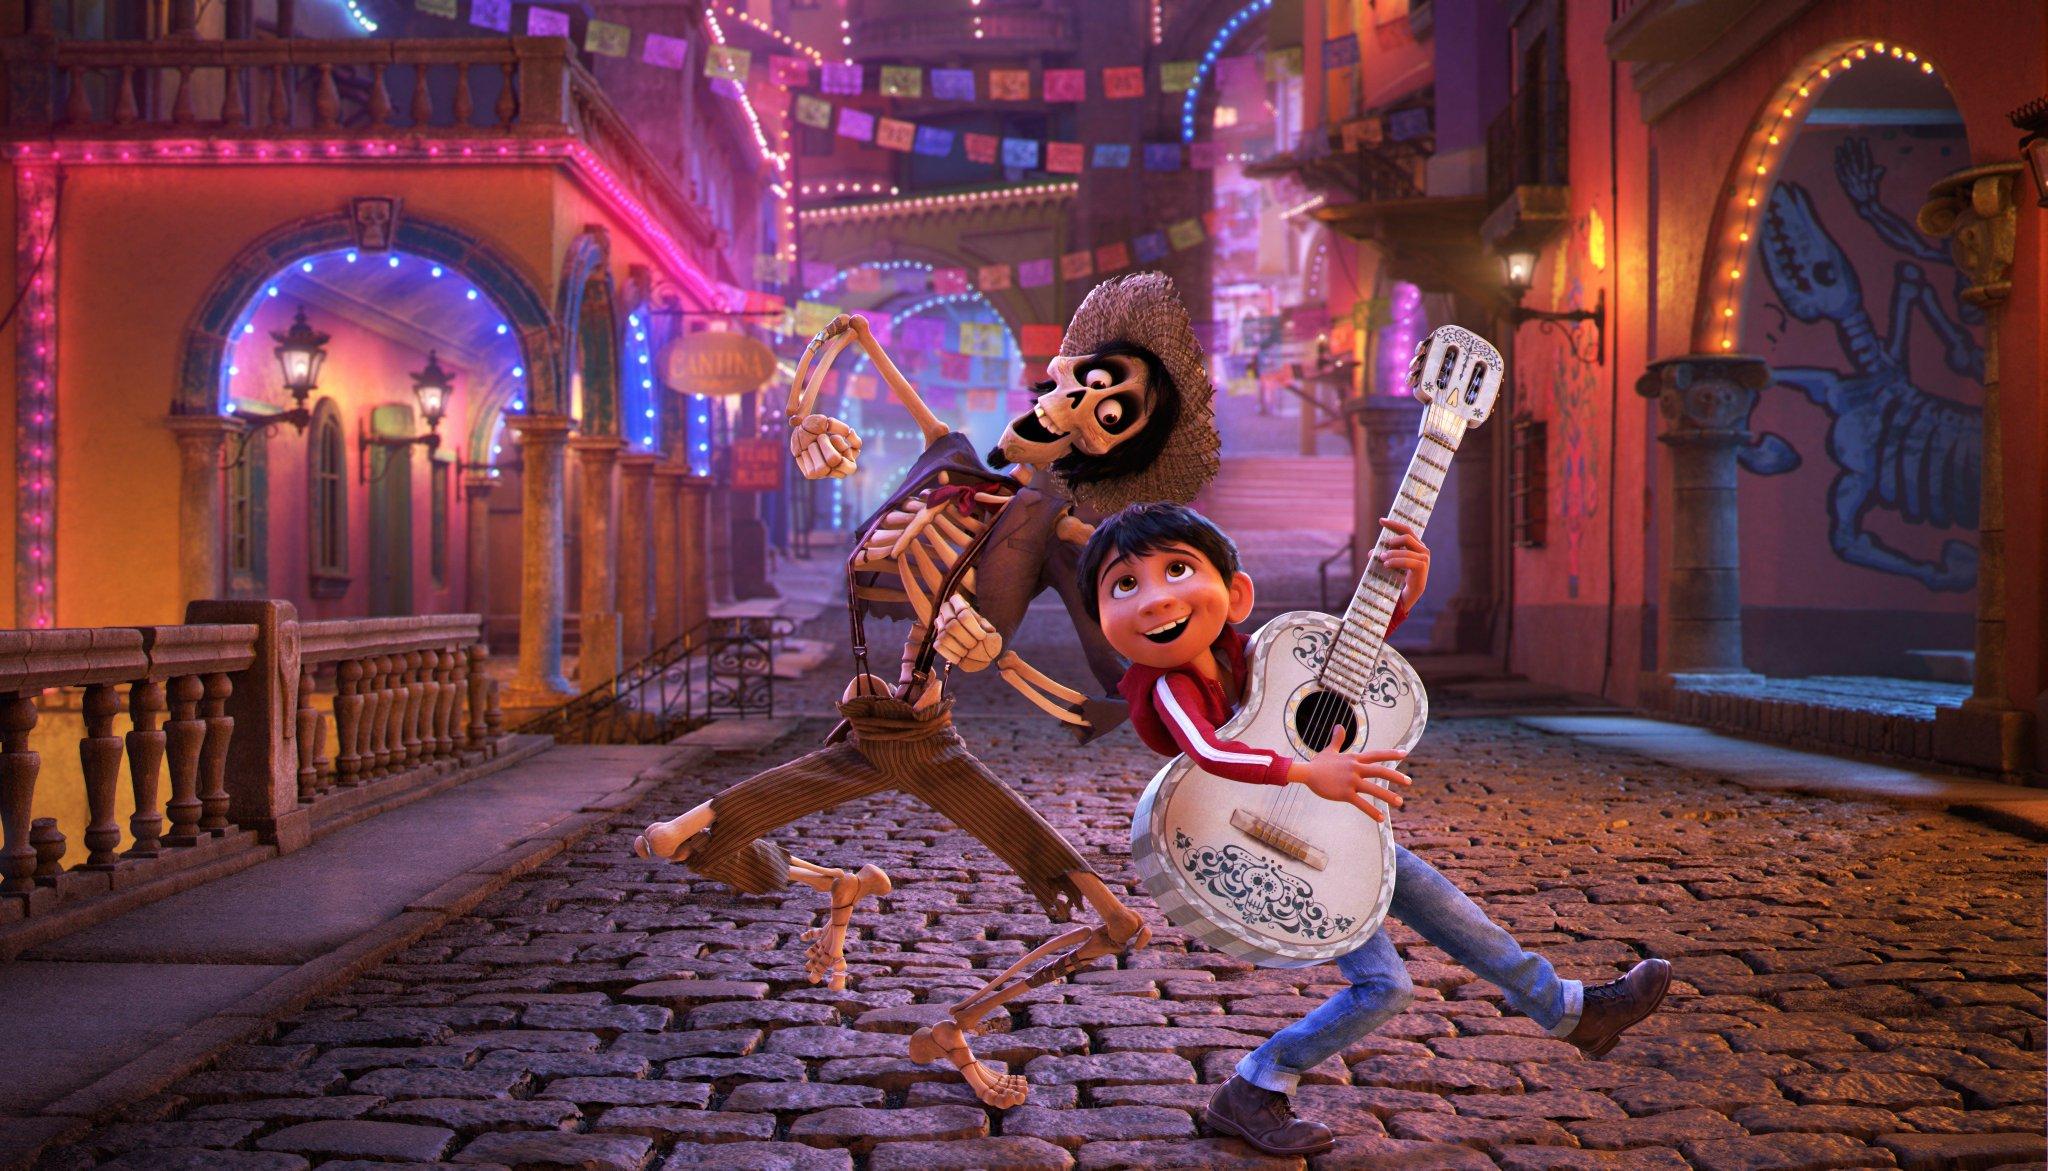 [Pixar] Coco (2017) - Sujet d'avant-sortie - Page 8 DEu10_wVoAAODB7?format=jpg&name=large